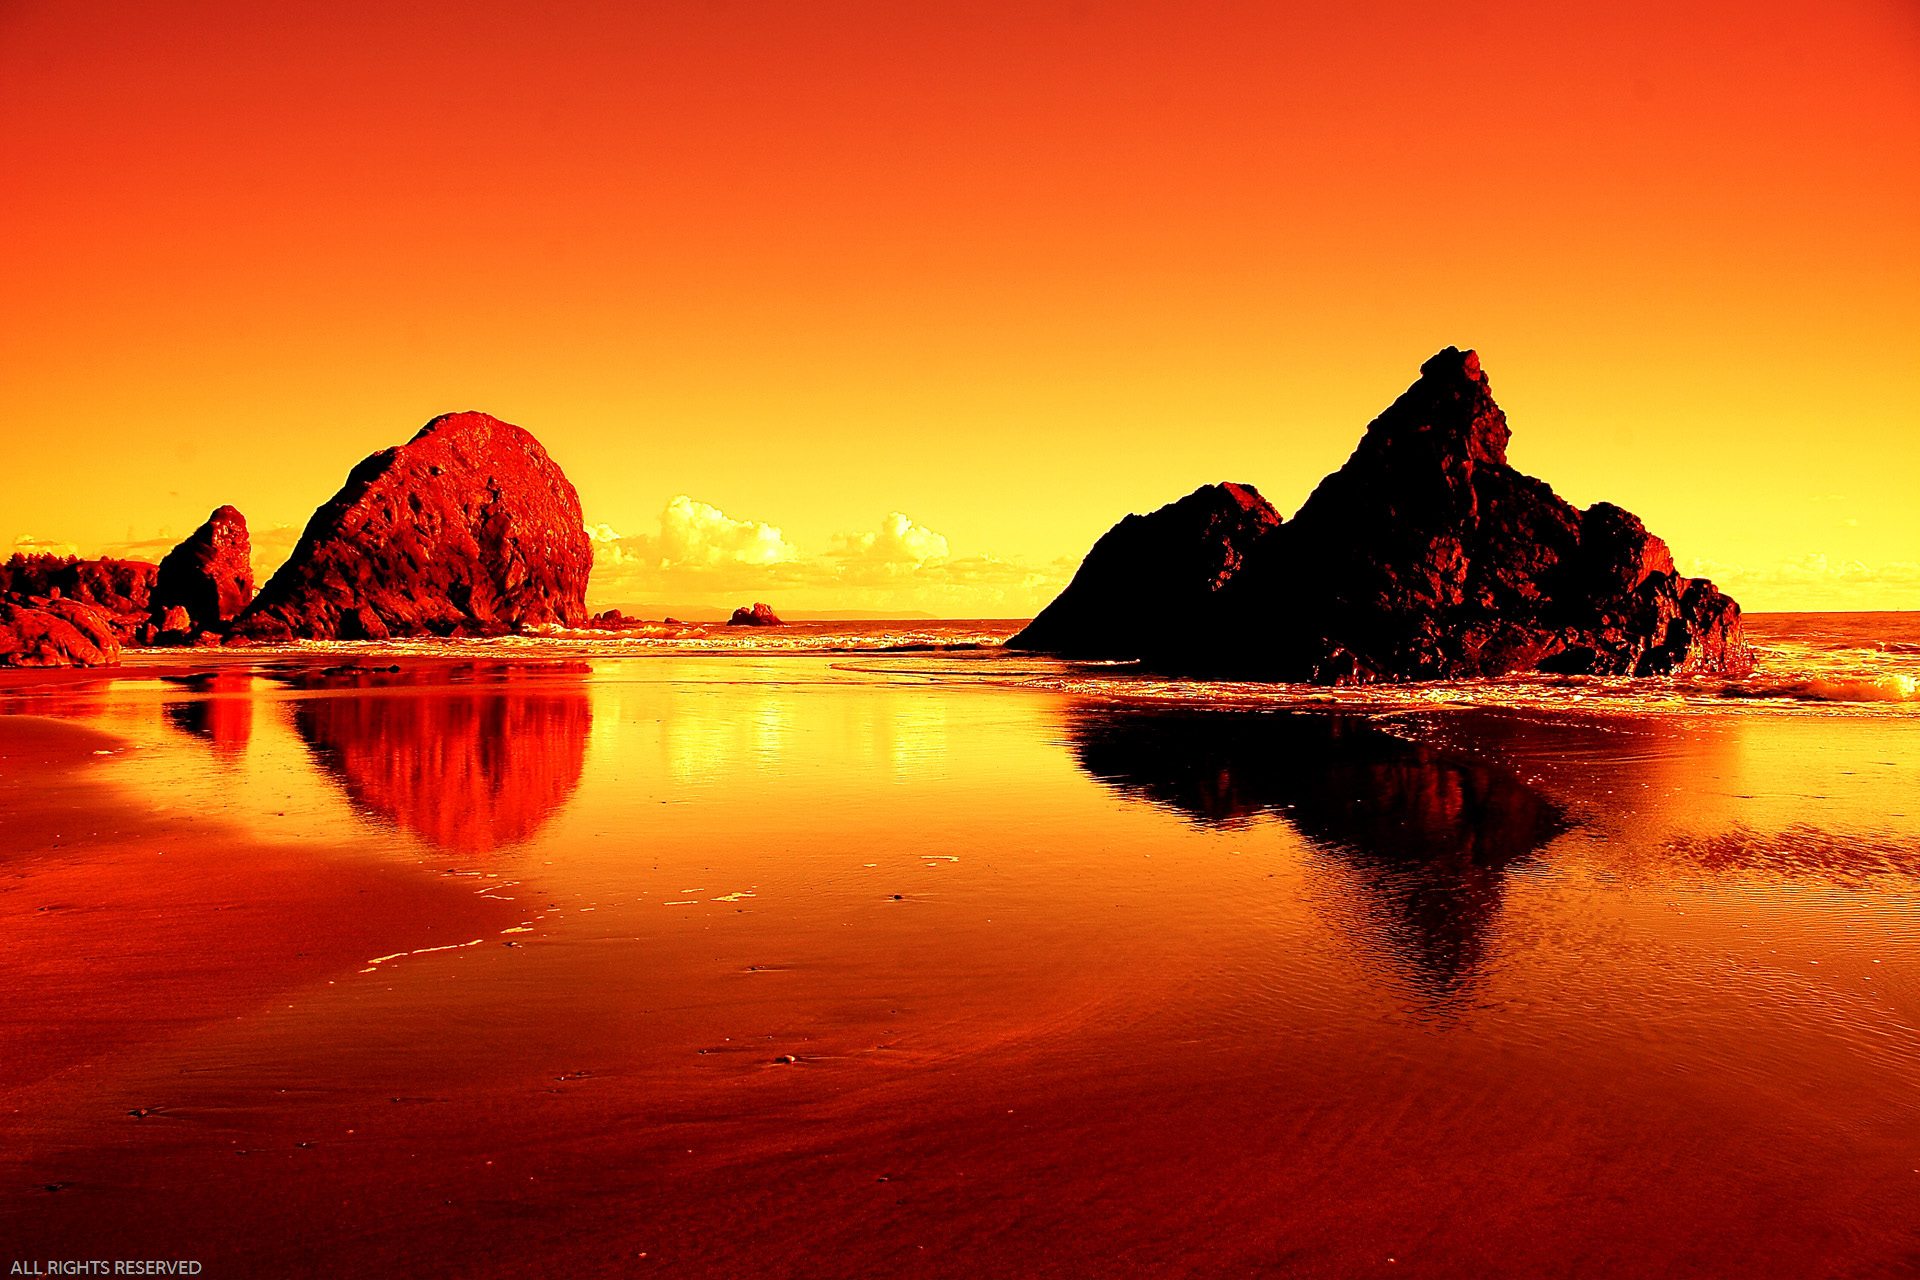 Sfondi desktop paesaggi hd tramonto rosso sfondi hd gratis for Immagini hd gratis